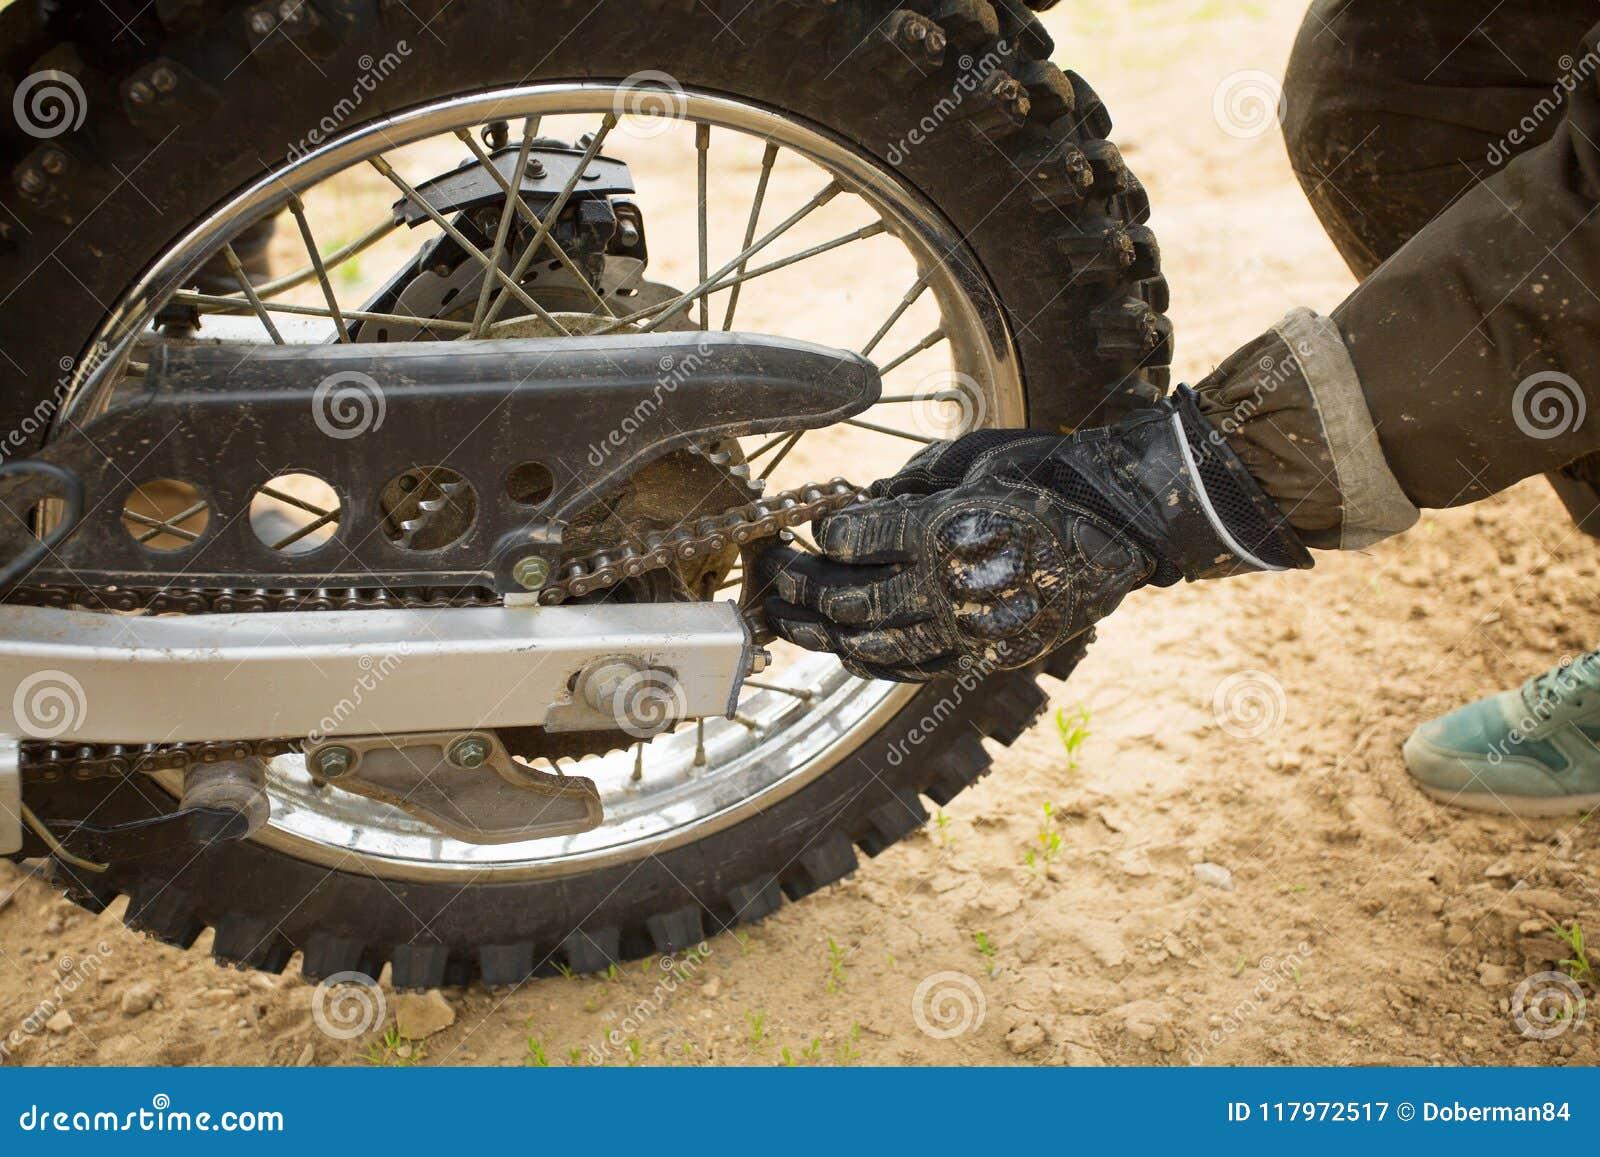 Man In Gloves Adjusting Chain On Rear Motorcycle Wheel